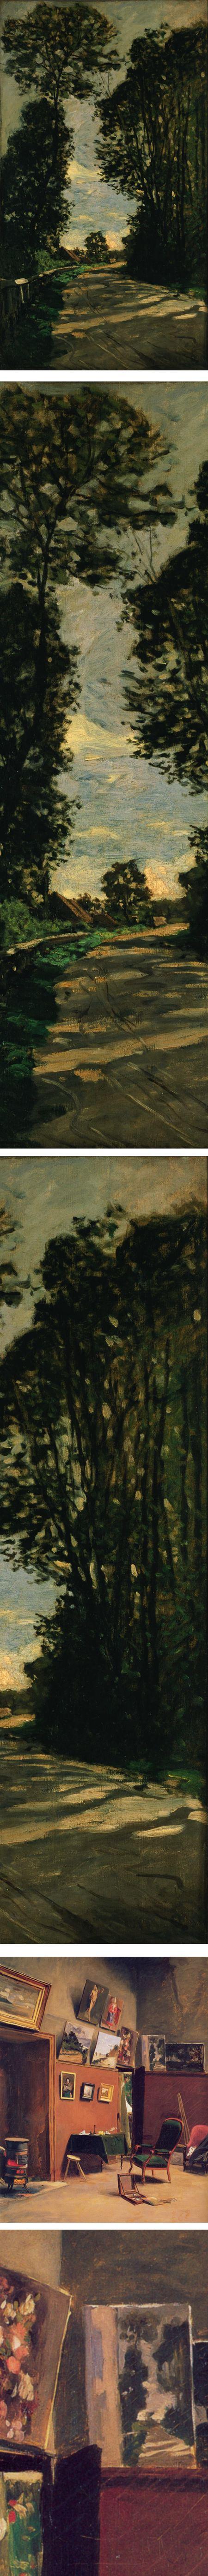 Walk (Road of the Farm Saint-Simeon), Claude Monet and Studion in the rue de Furstenberg, Frederic Bazille